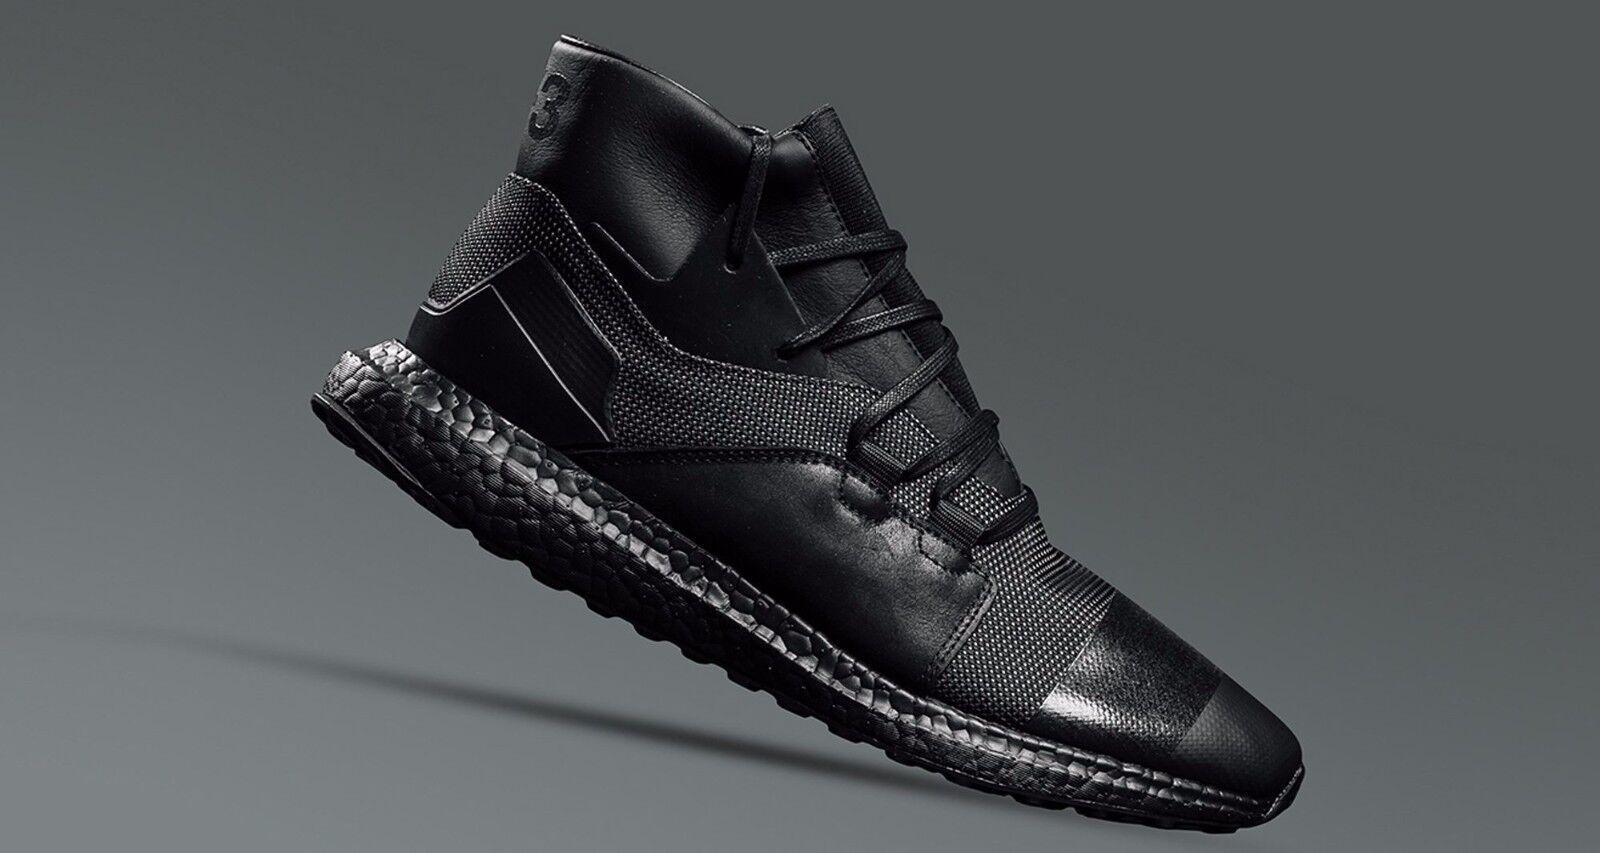 Adidas Y-3 Kozoko High 12. Triple Black. Yohji Yamamoto. ultra boost. CG3160.